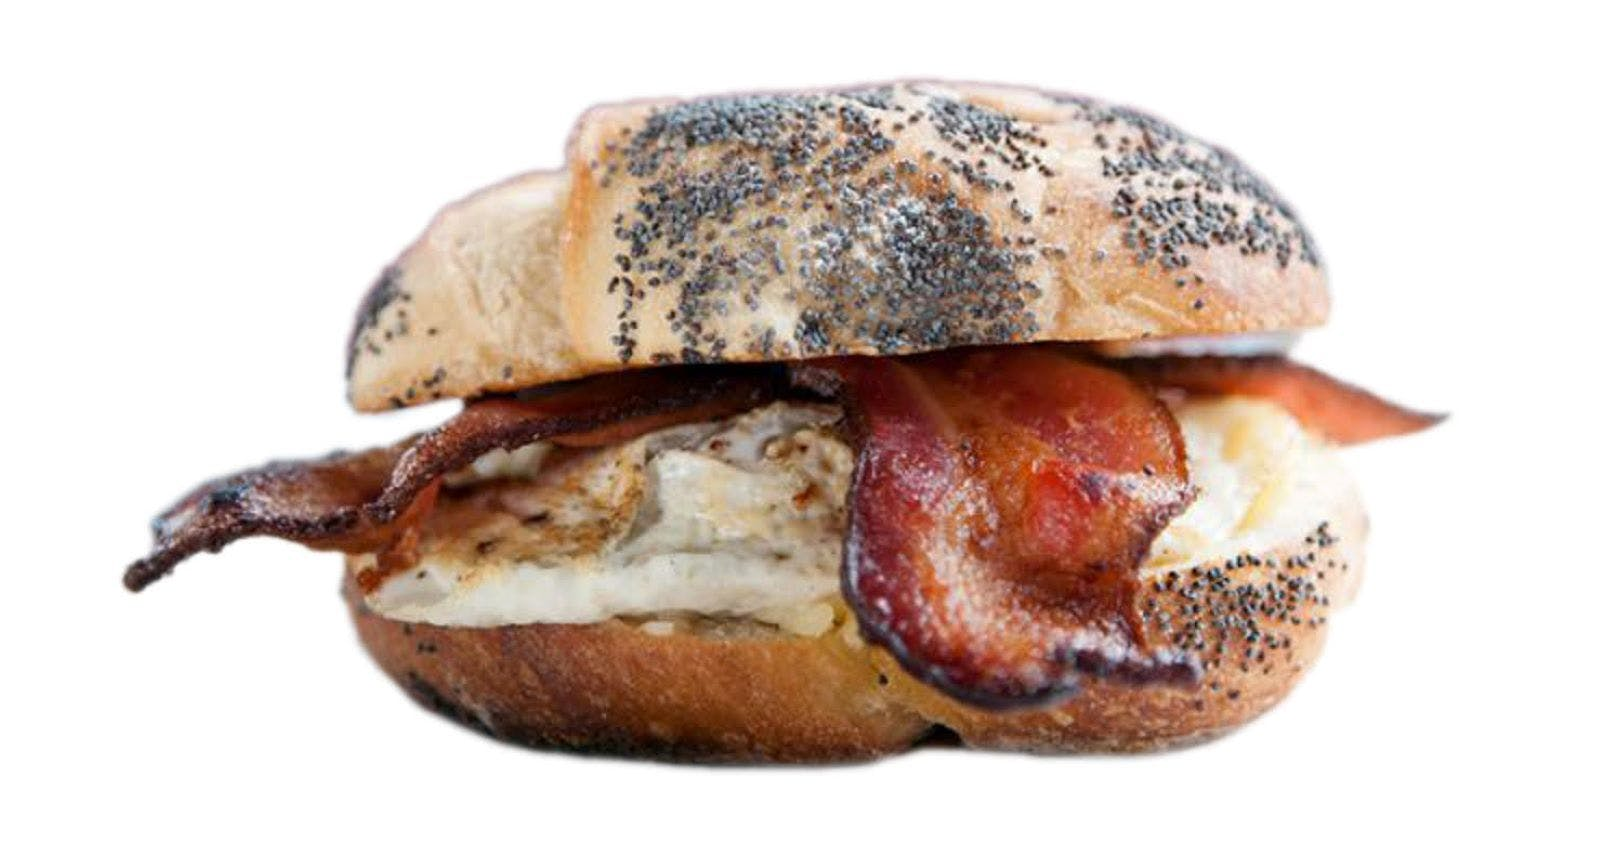 Polo Grounds Breakfast Sandwich from Gandolfo's New York Deli - American Fork in American Fork, UT